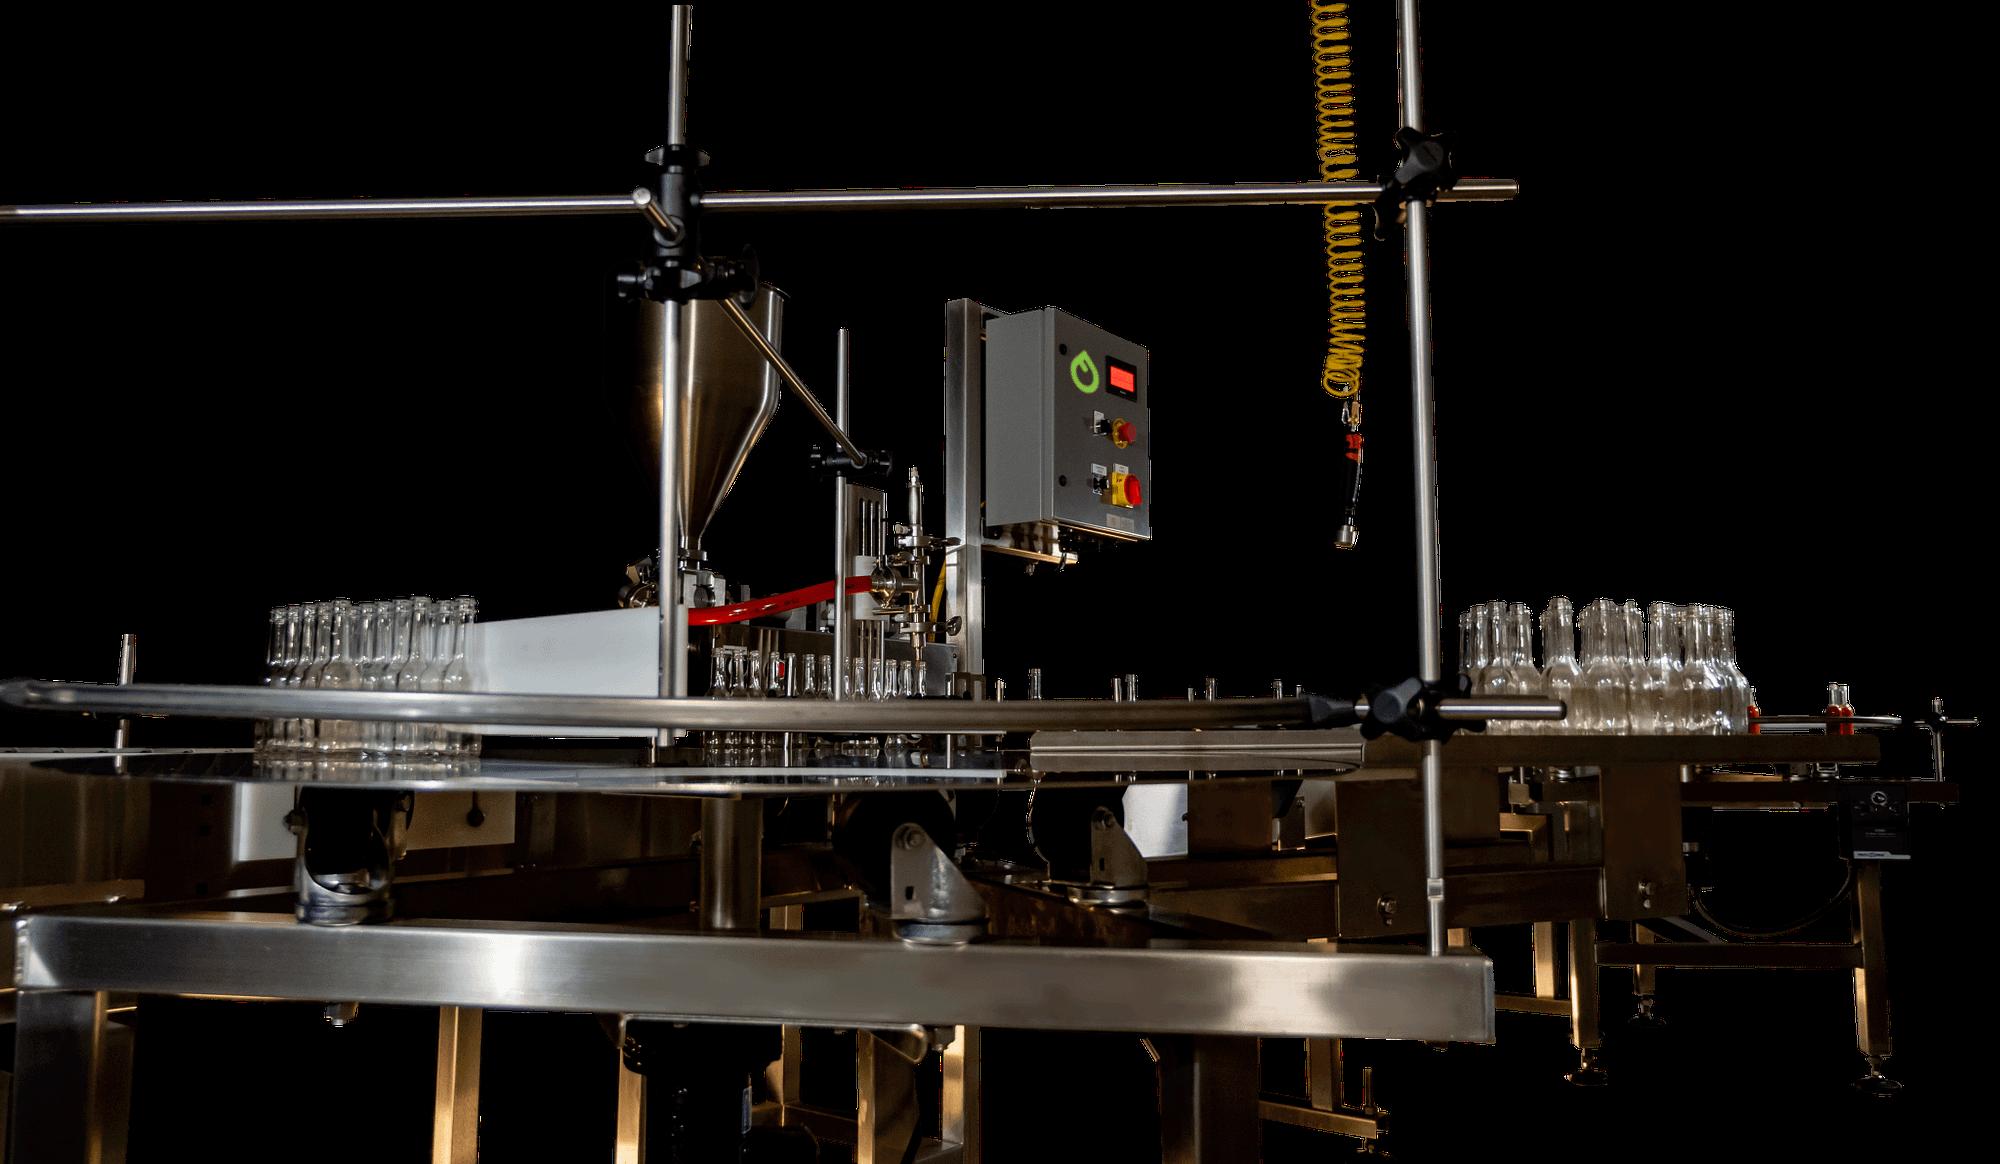 Tabletop Piston Liquid Filling Line